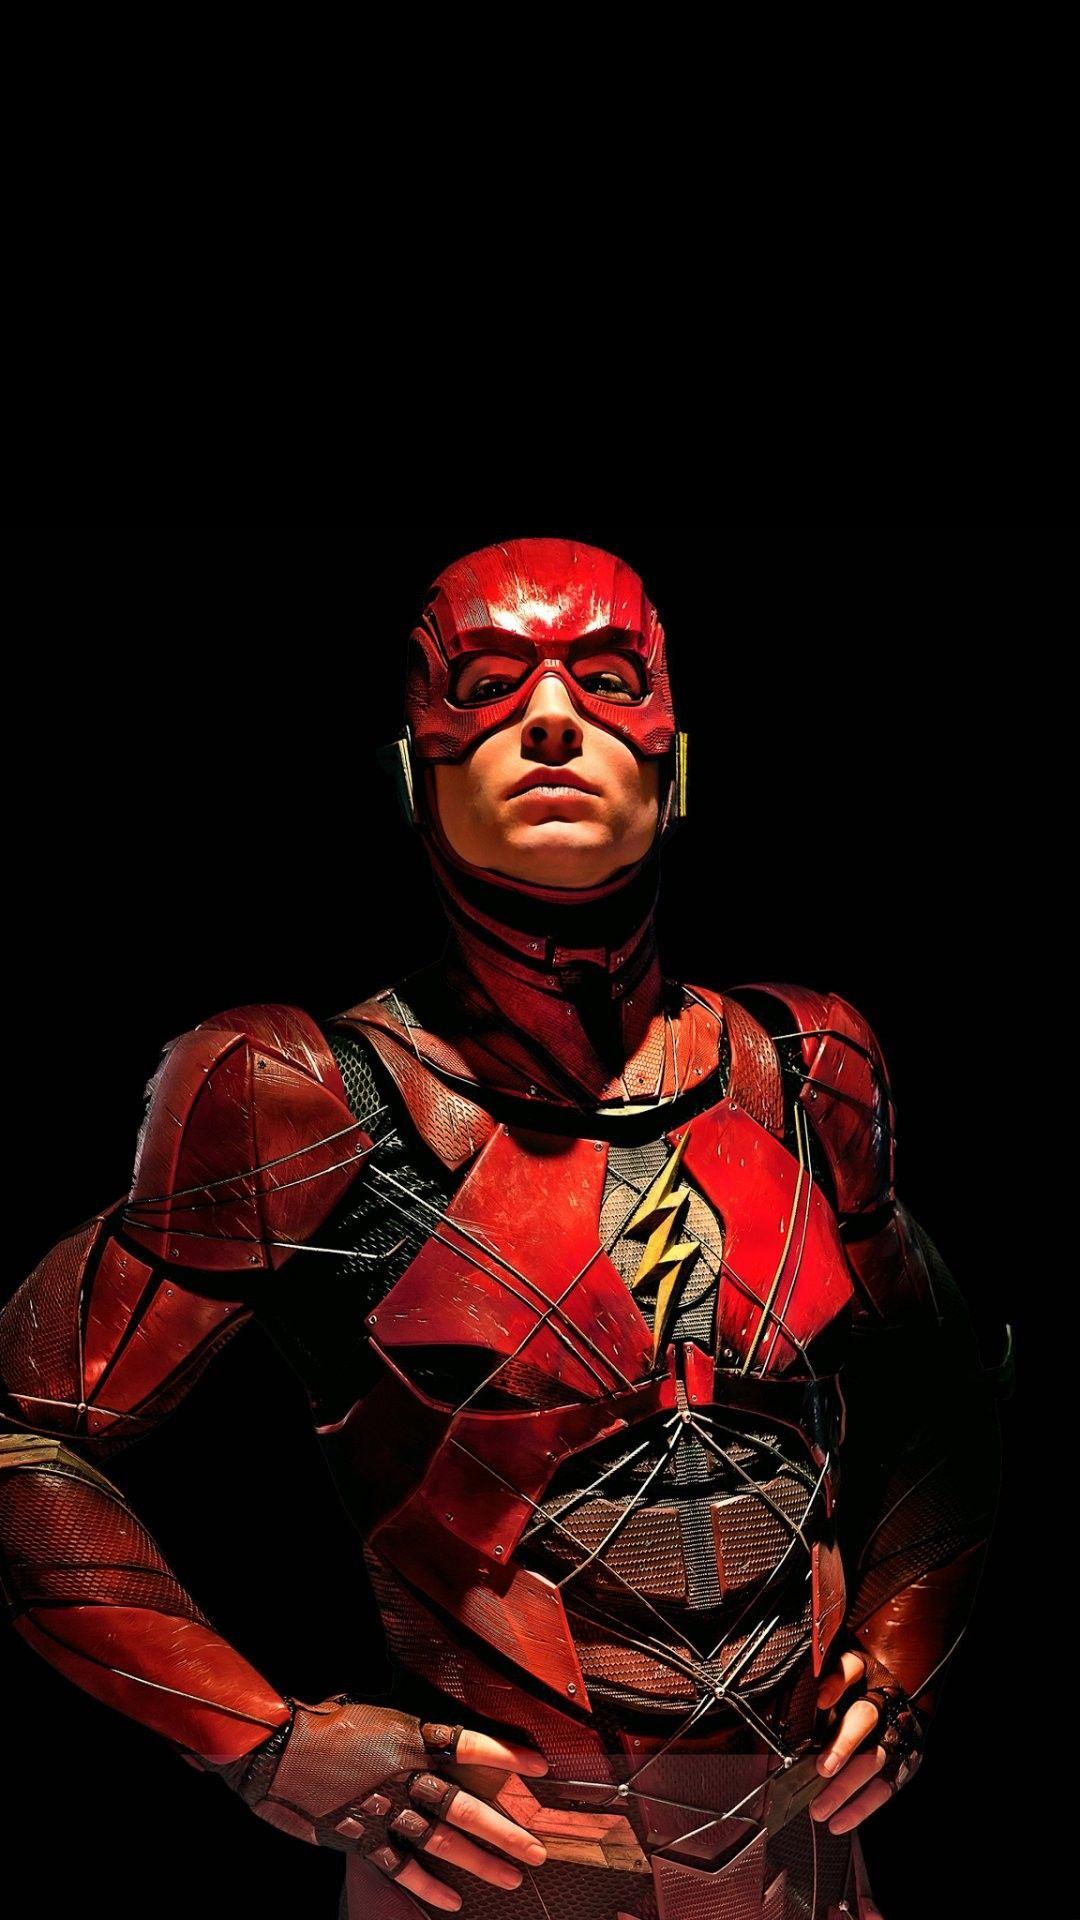 The Flash 59 Superhero poster, Justice league, Justice